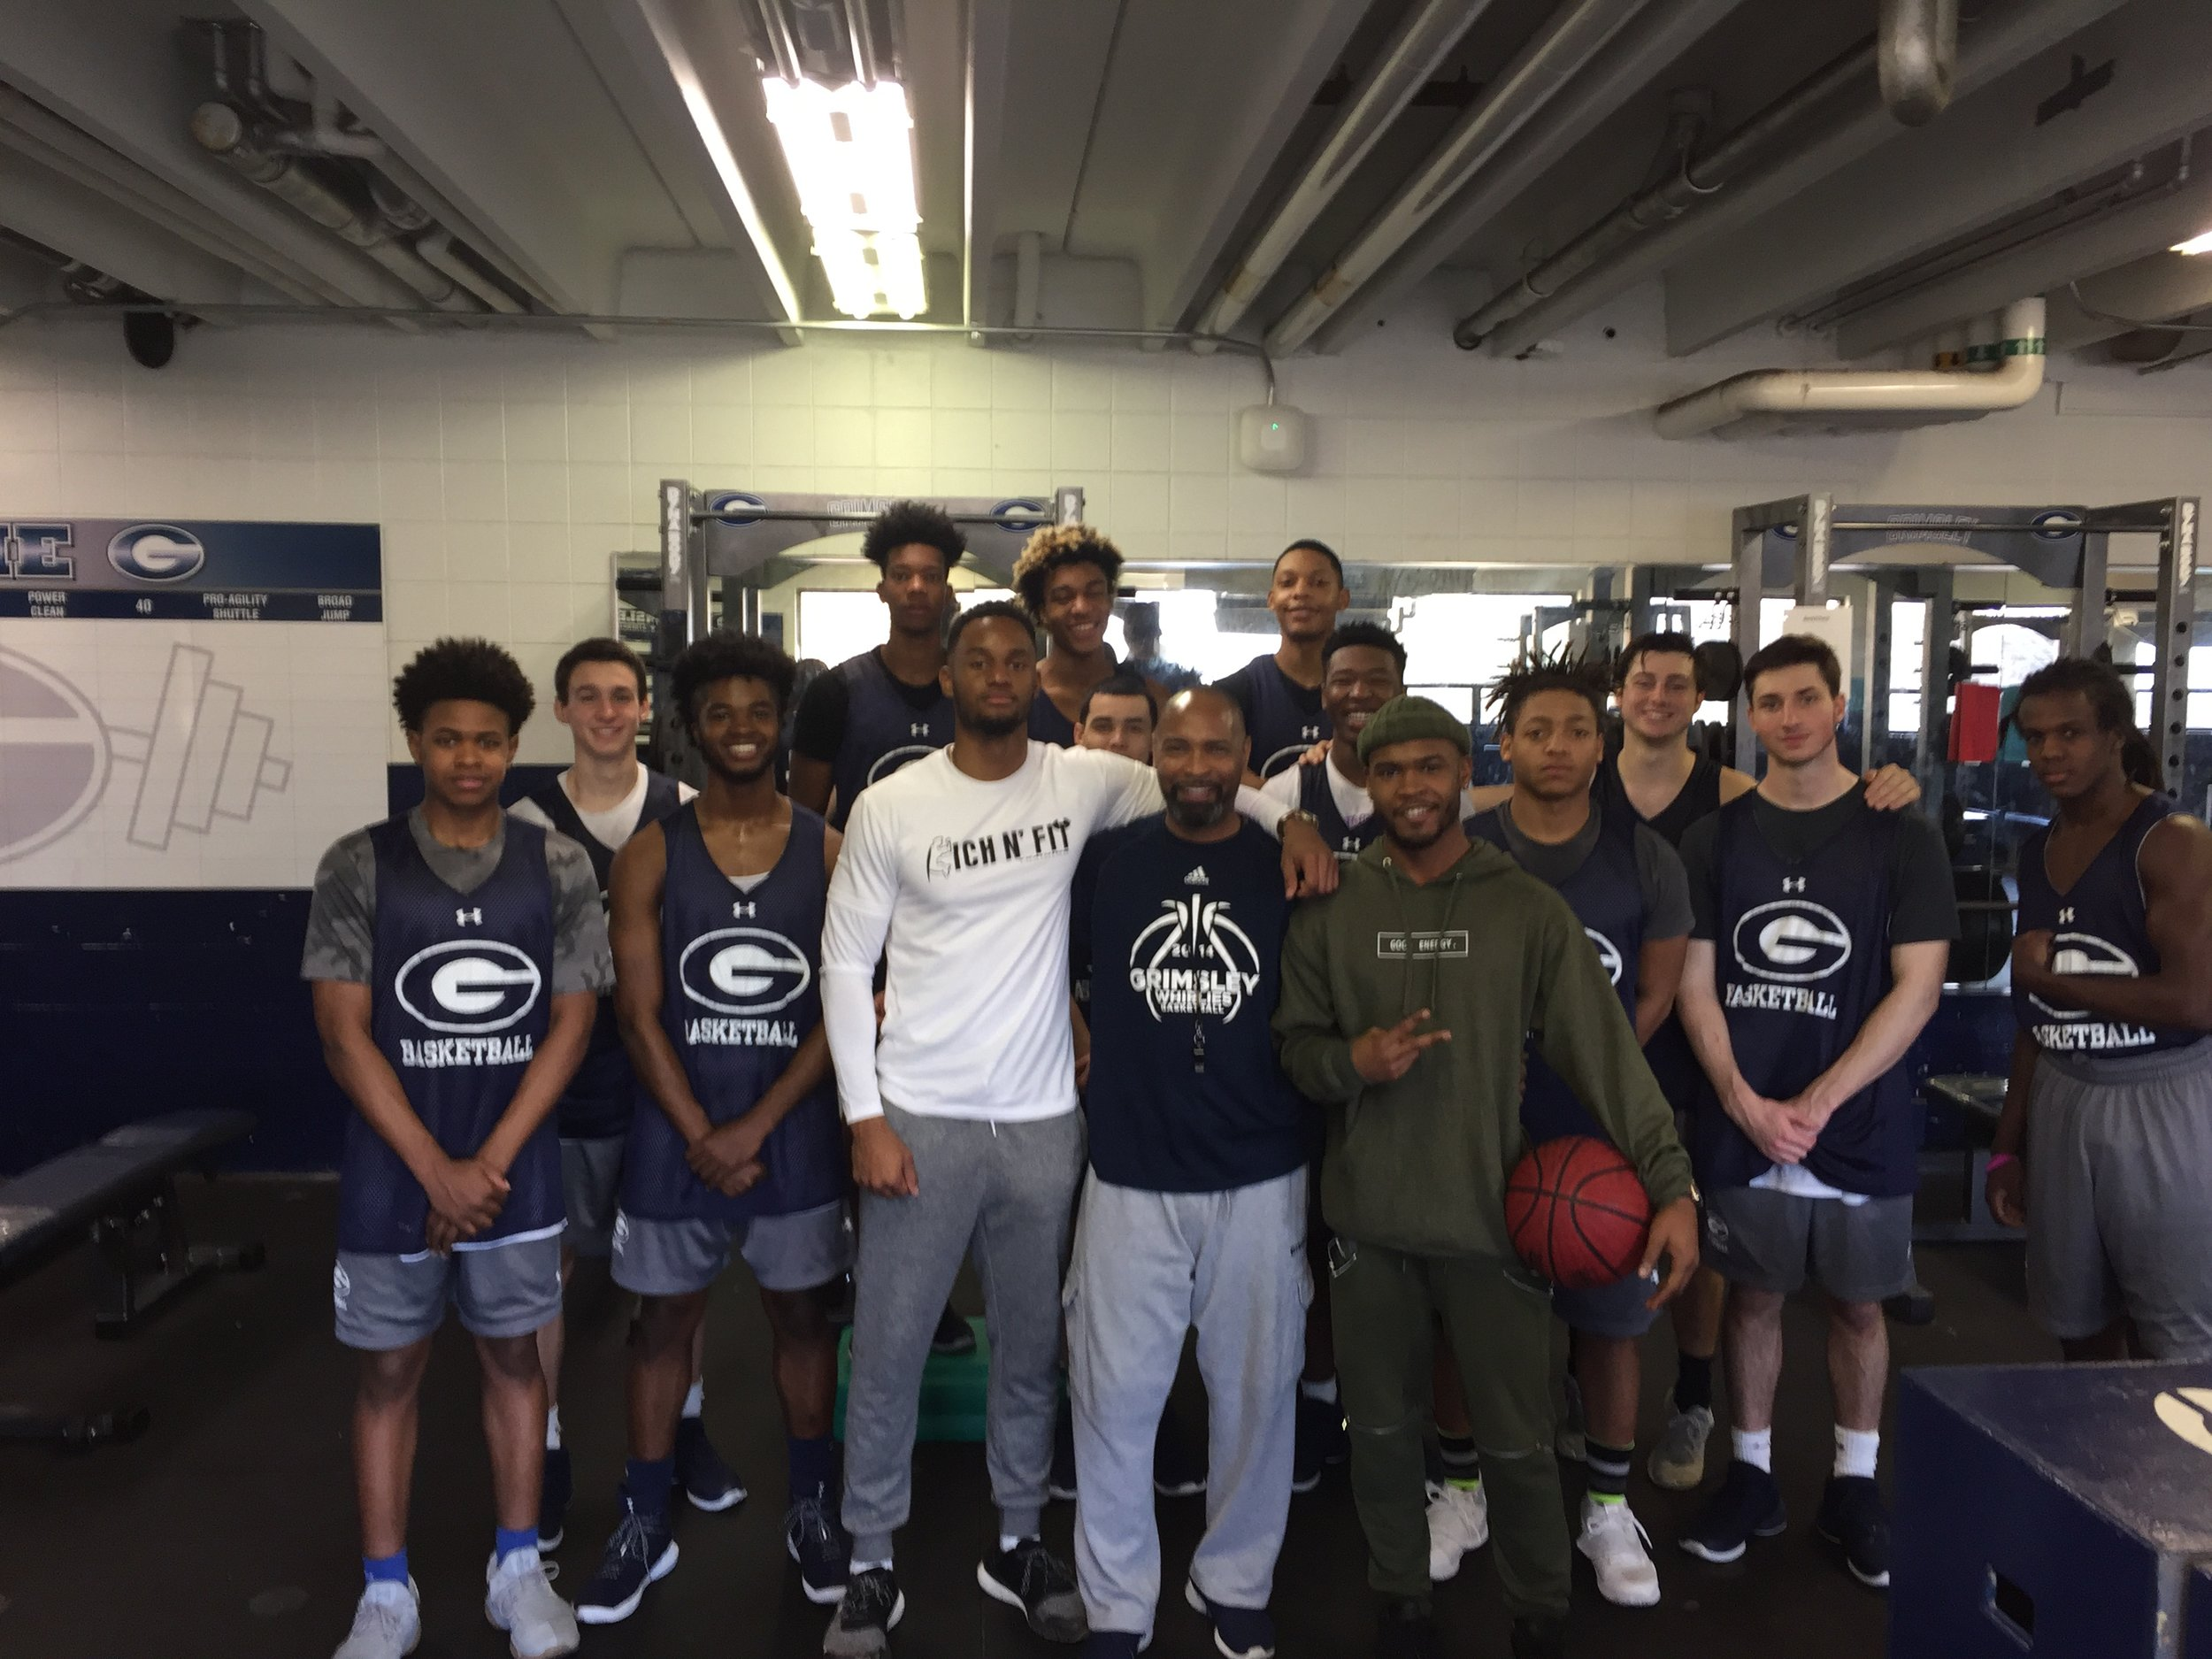 Grimsley High School Men's Basketball